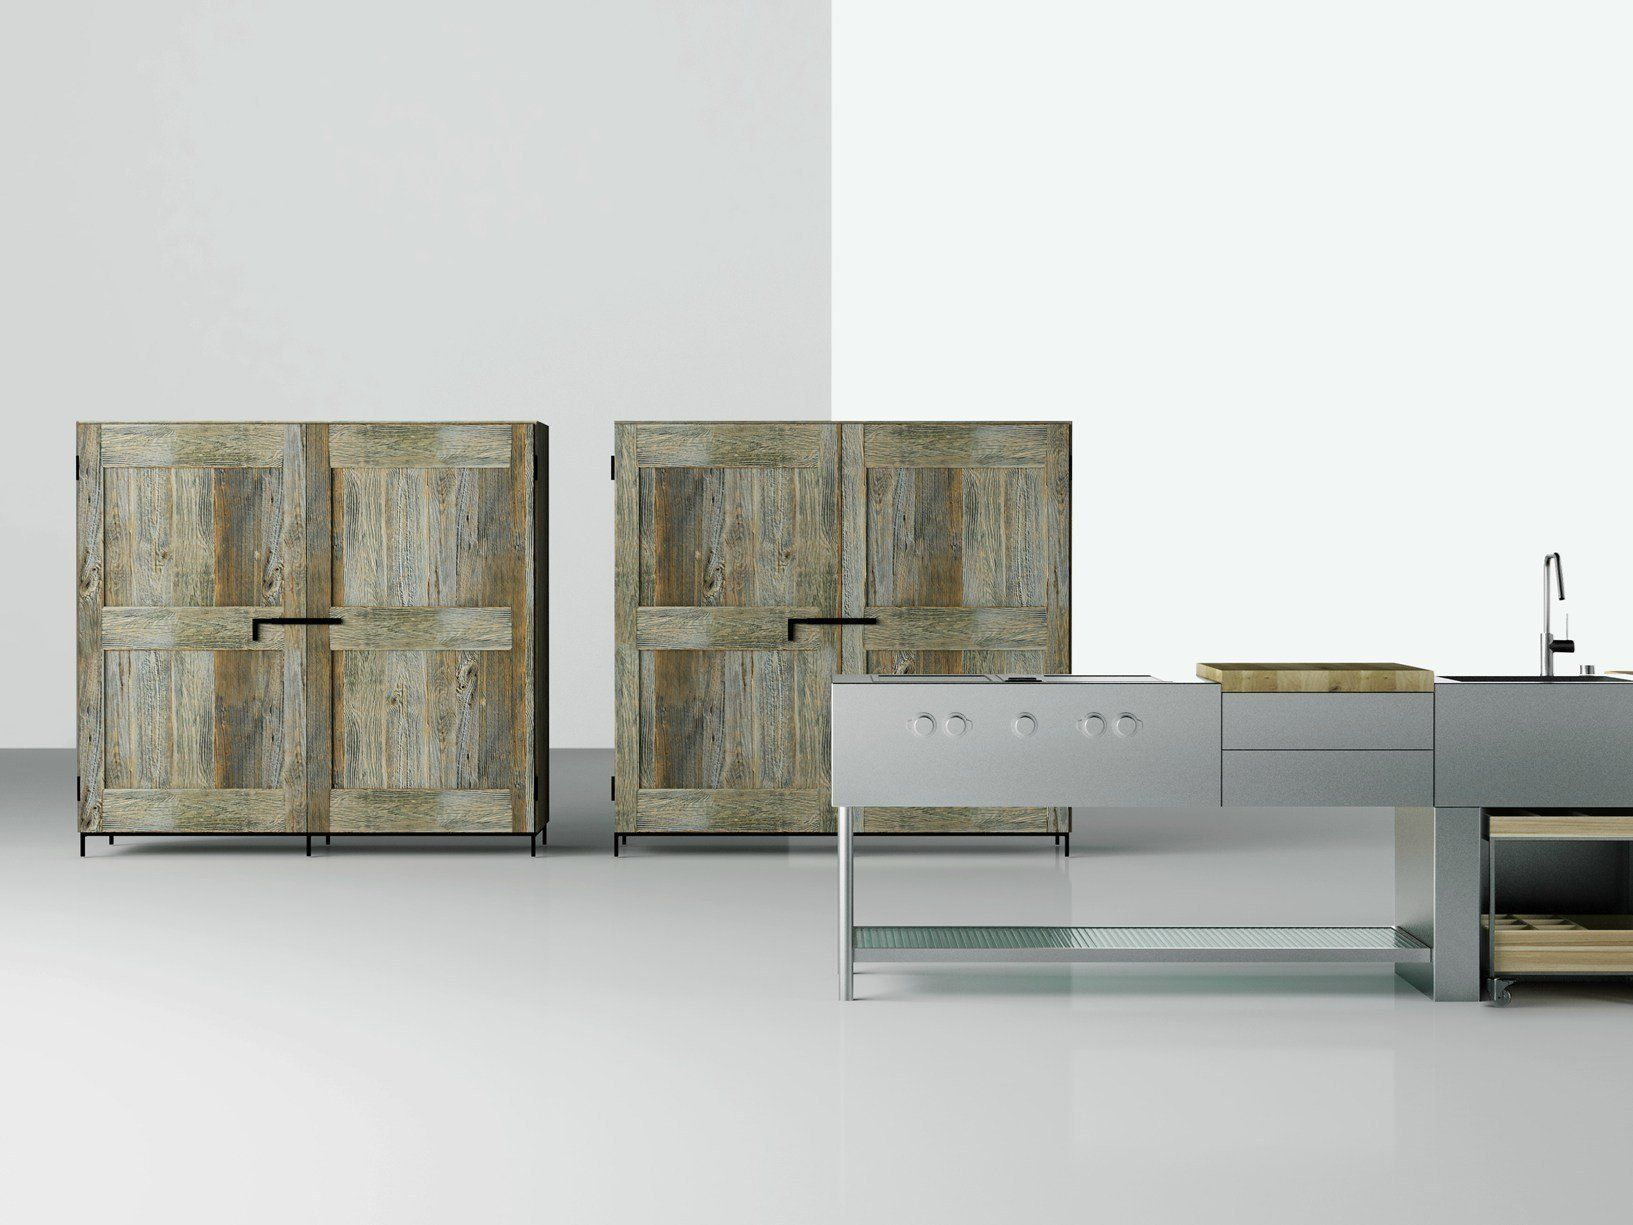 boffi al bologna water design con la cucina open - Boffi Cucina